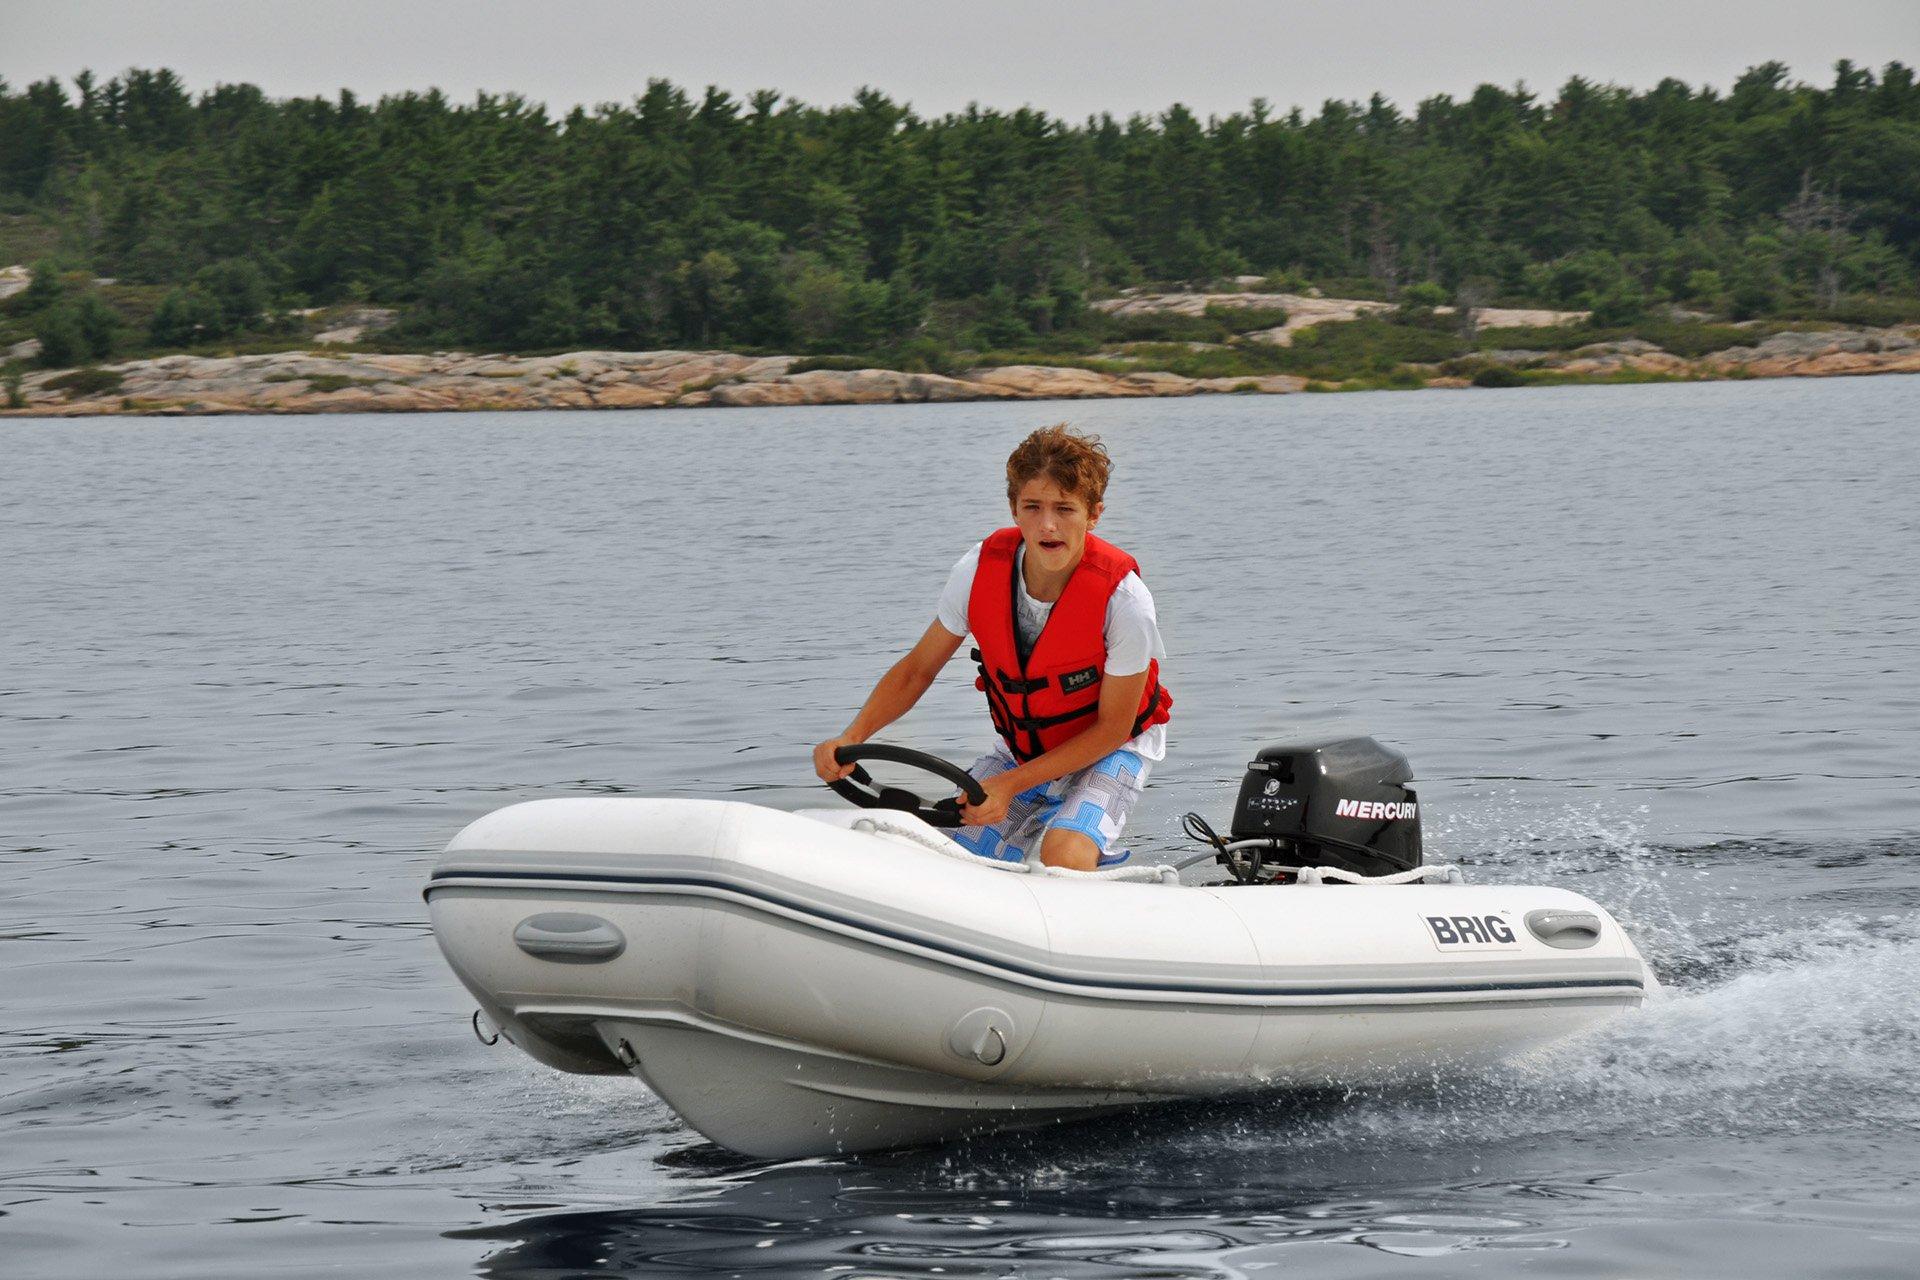 Falcon 300 RIB Boat